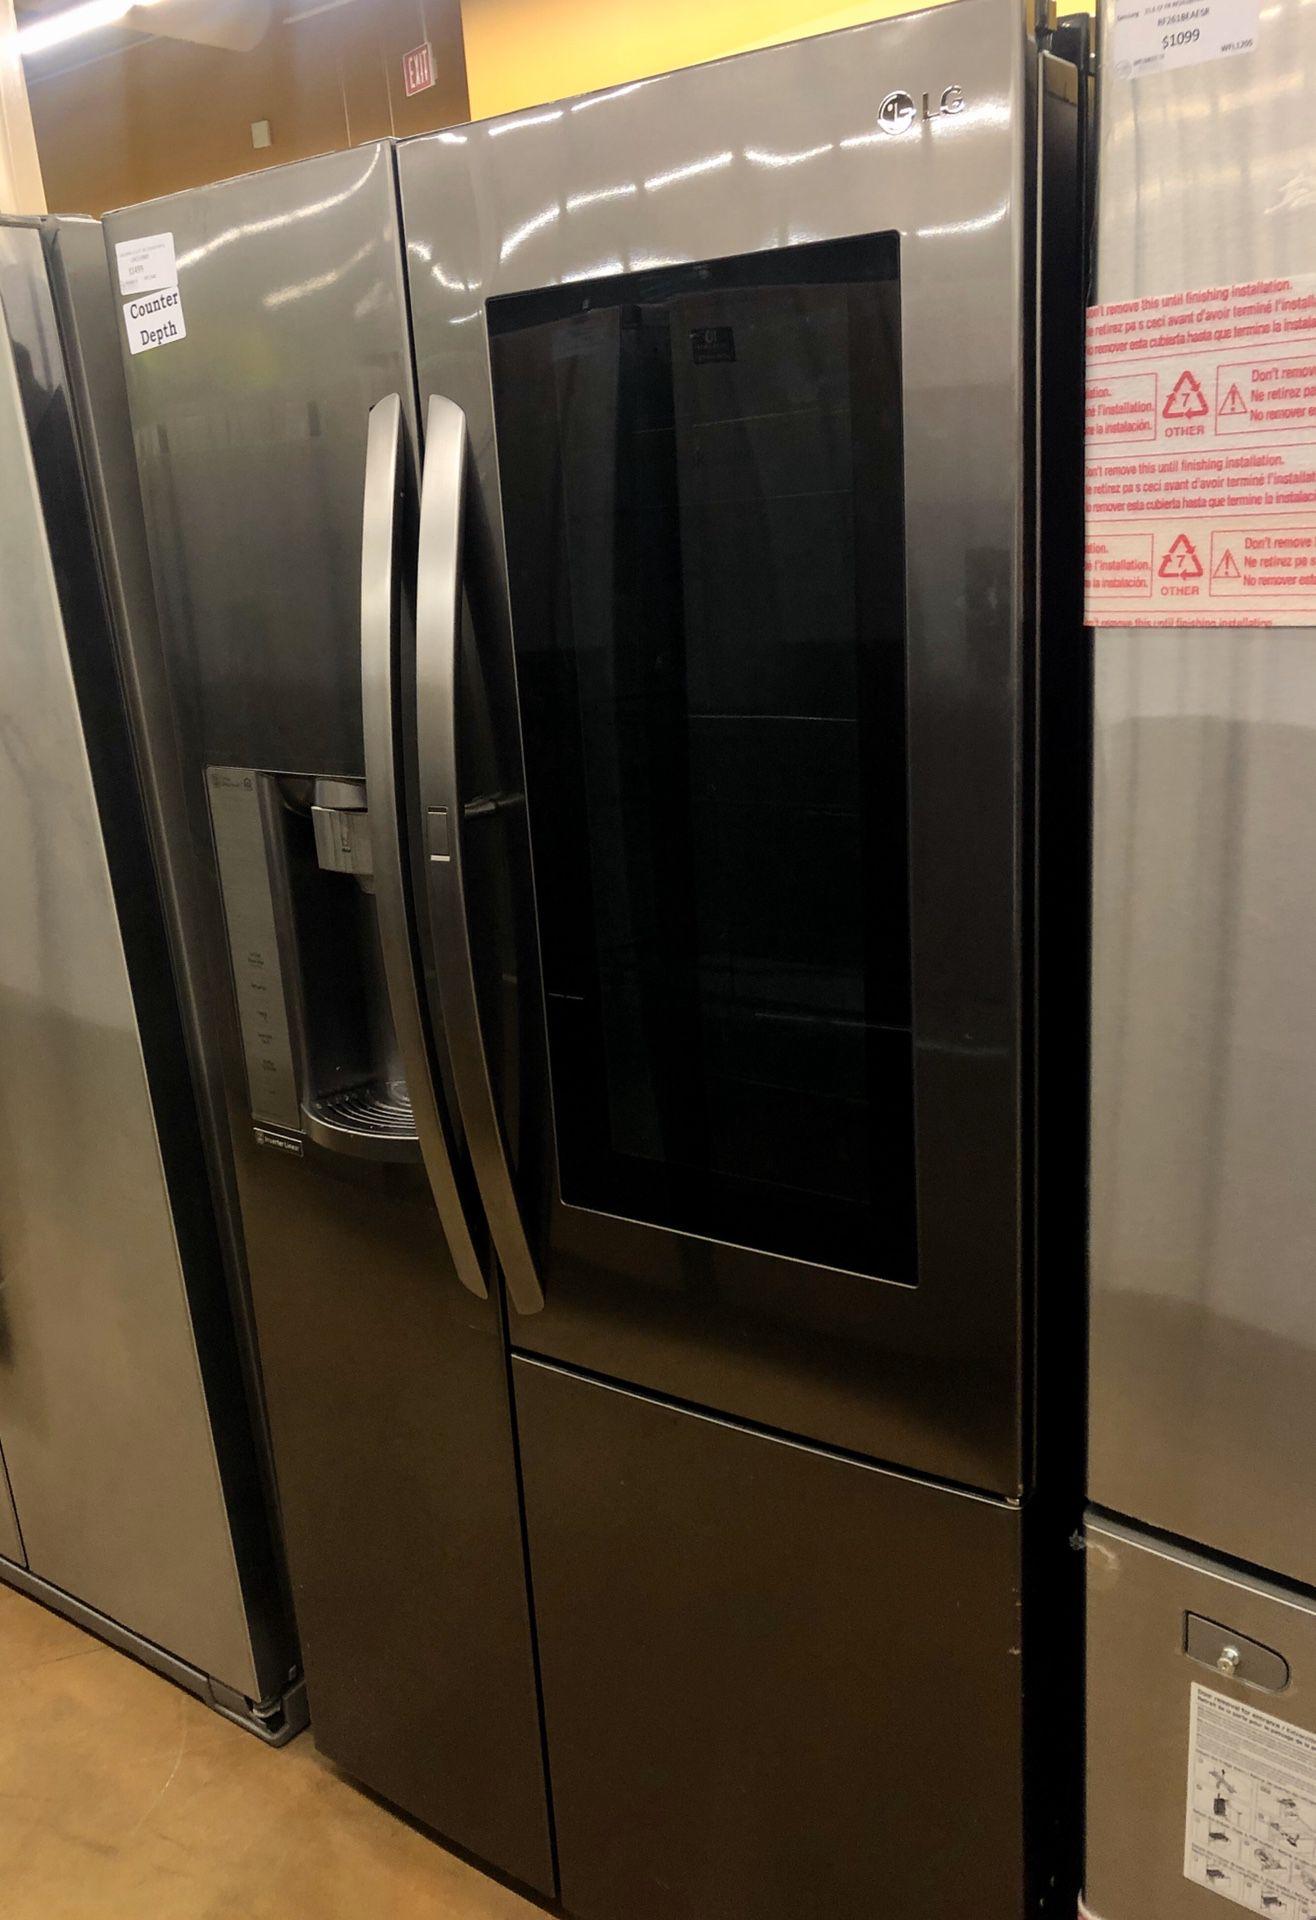 LG Refrigerator with instaview